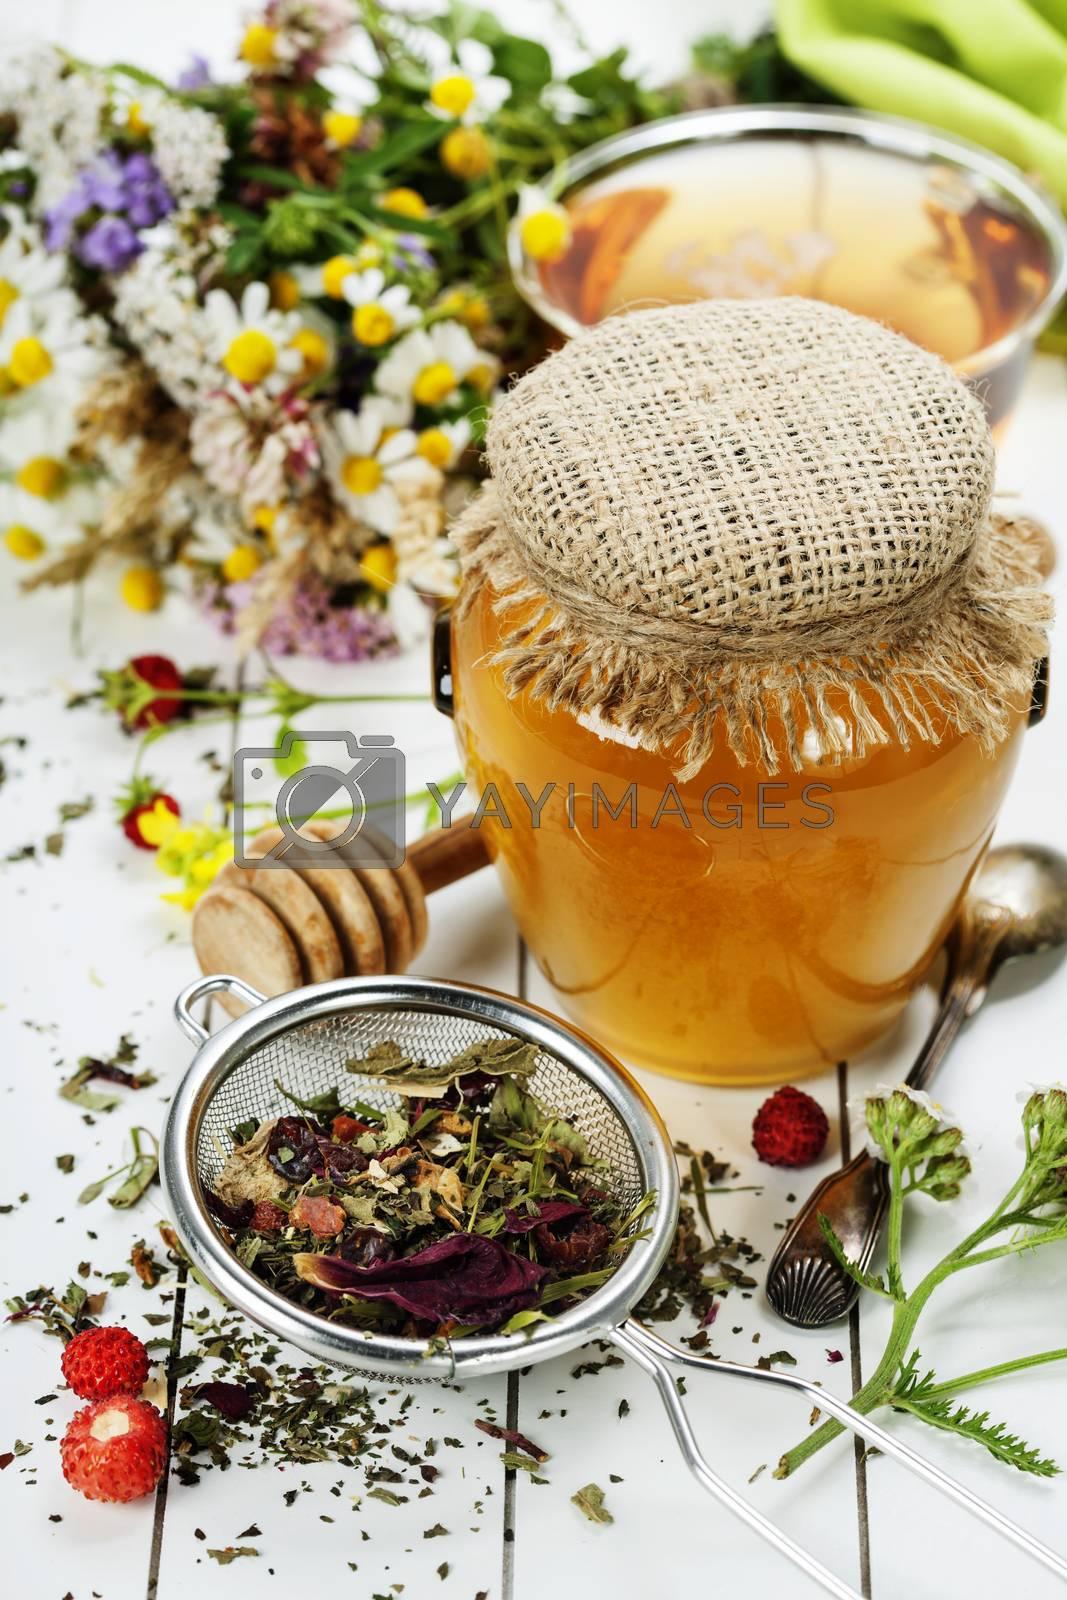 Honey and Herbal tea by klenova